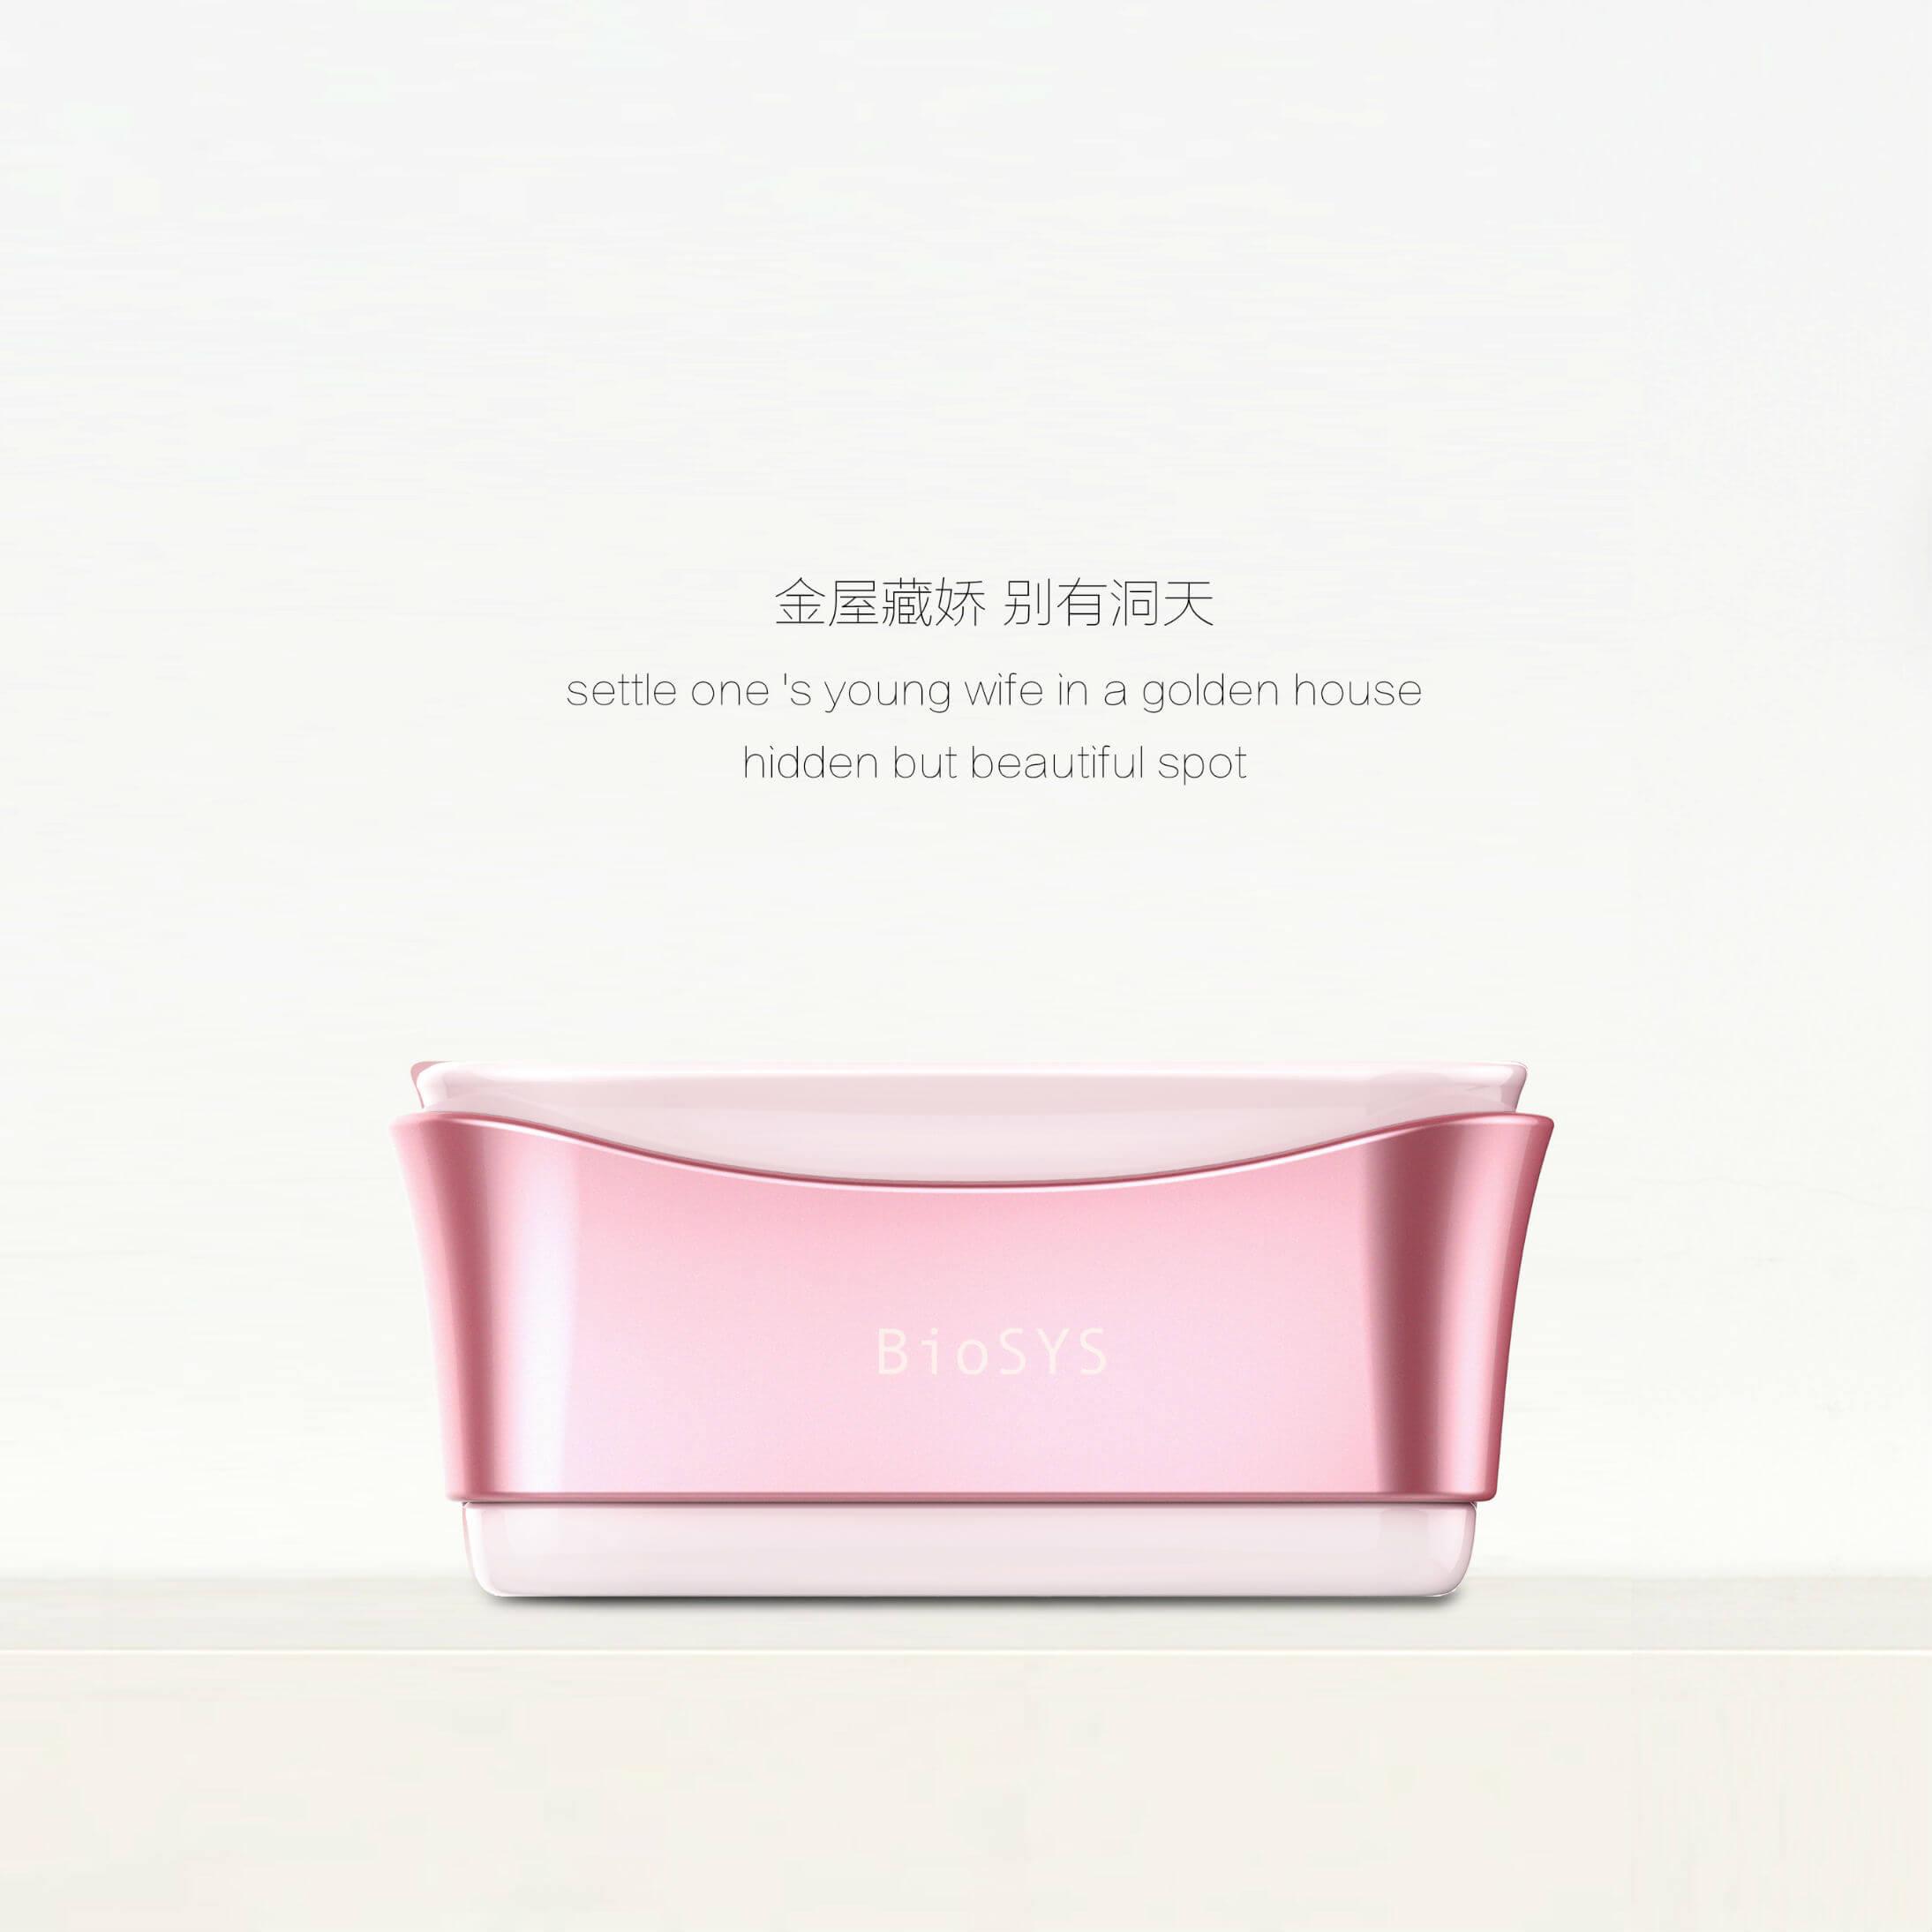 BioSYS隐形眼镜消毒盒设计